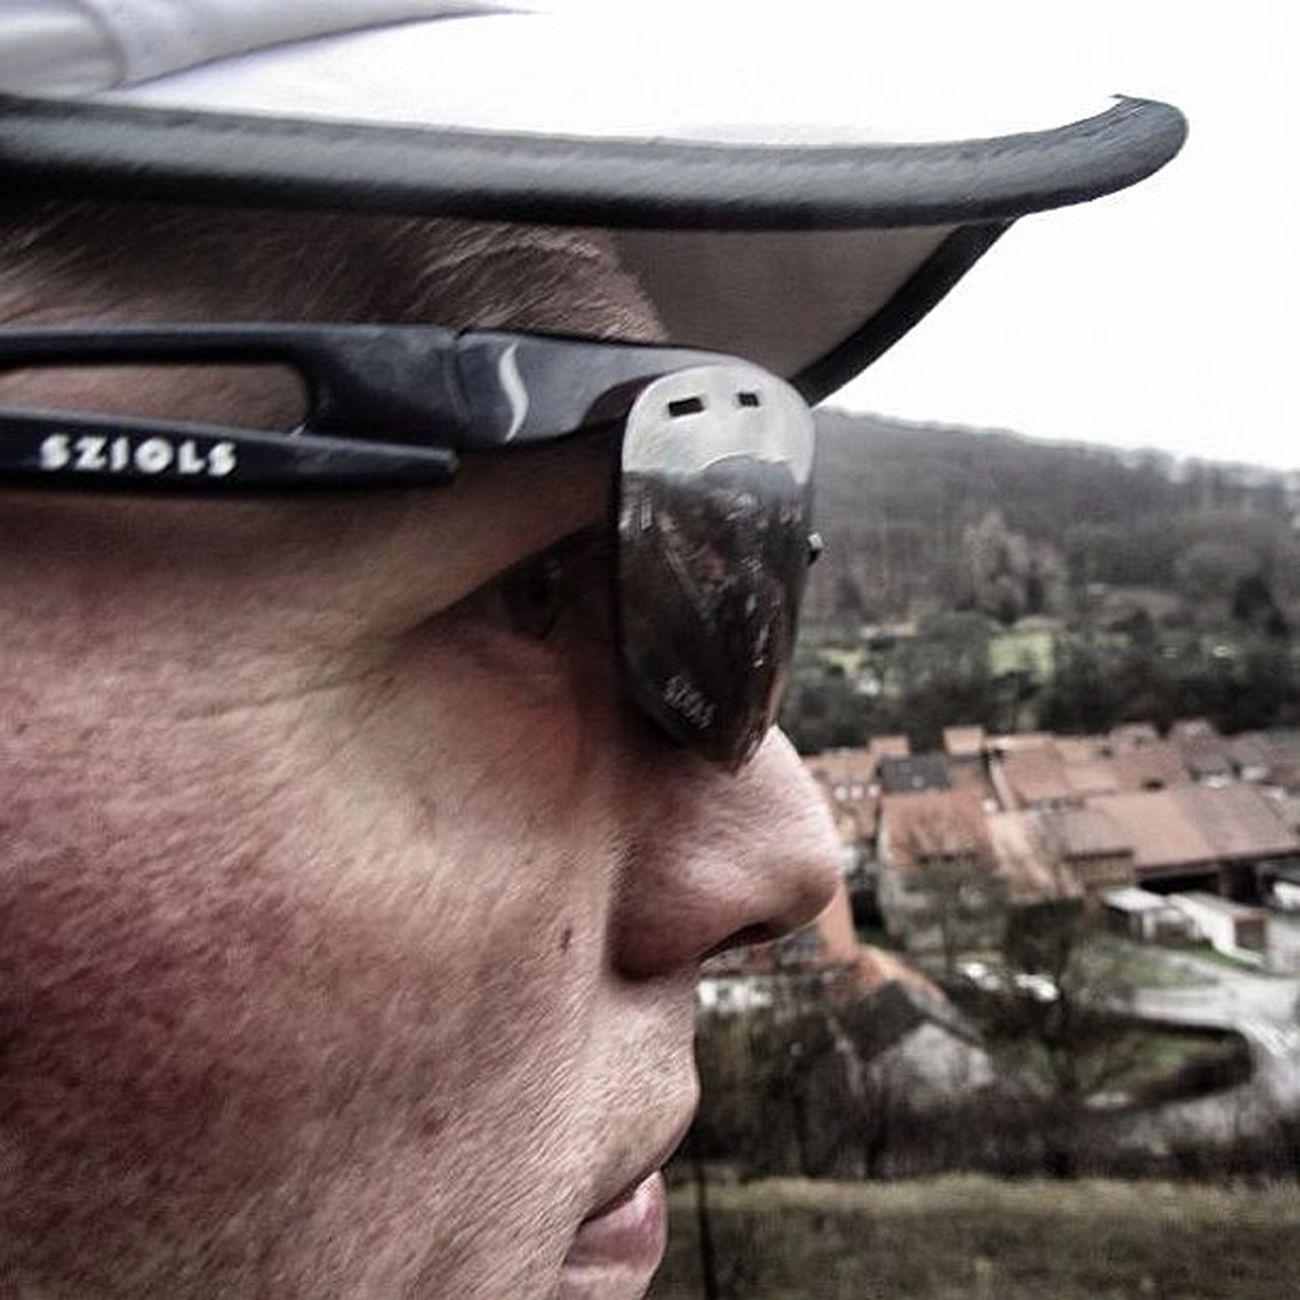 Sklblog Sziols Xkross Sponser Salzdetfurth Run Laufen